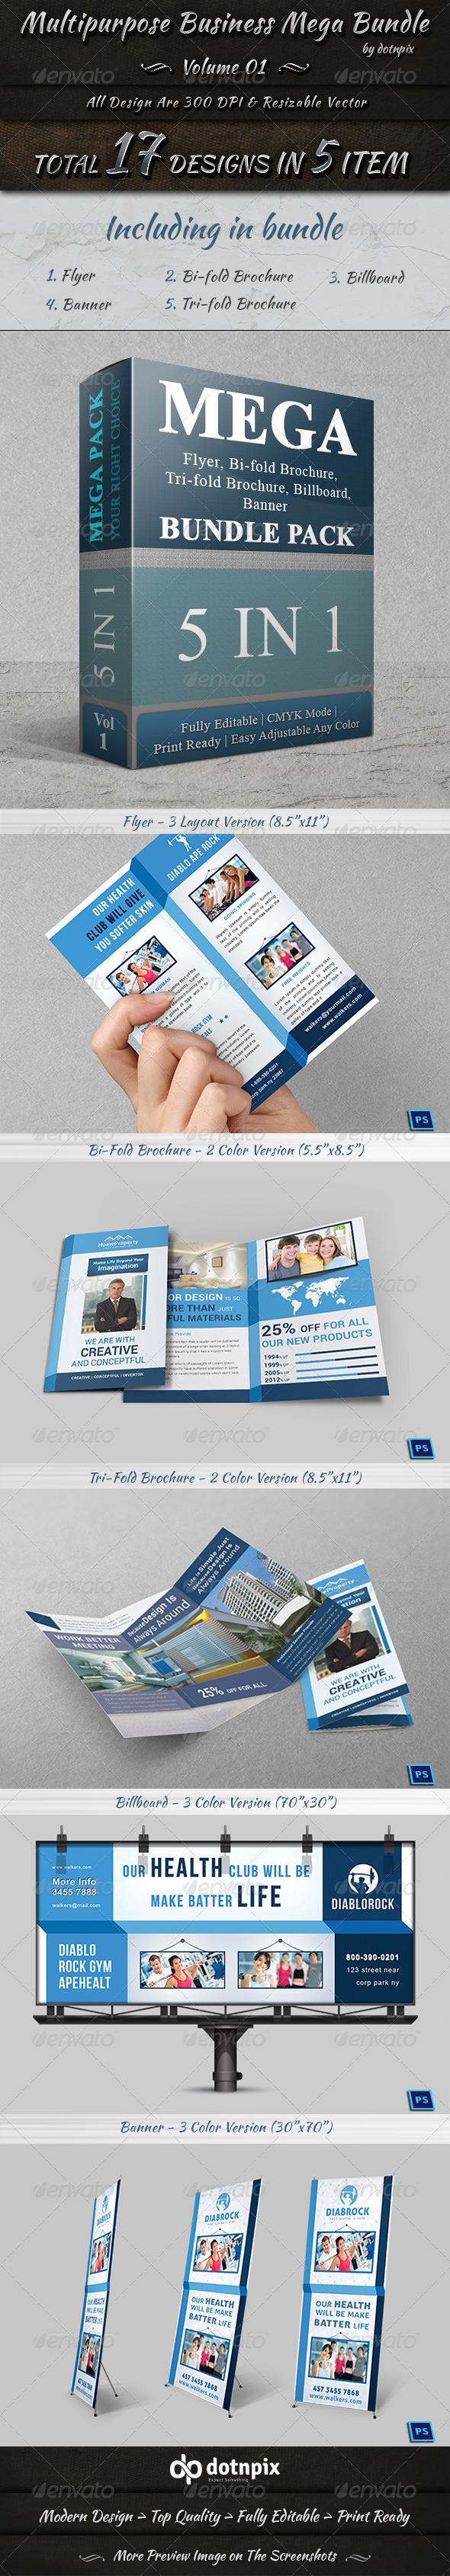 GraphicRiver Multipurpose Business Mega Bundle Volume 1 7688791